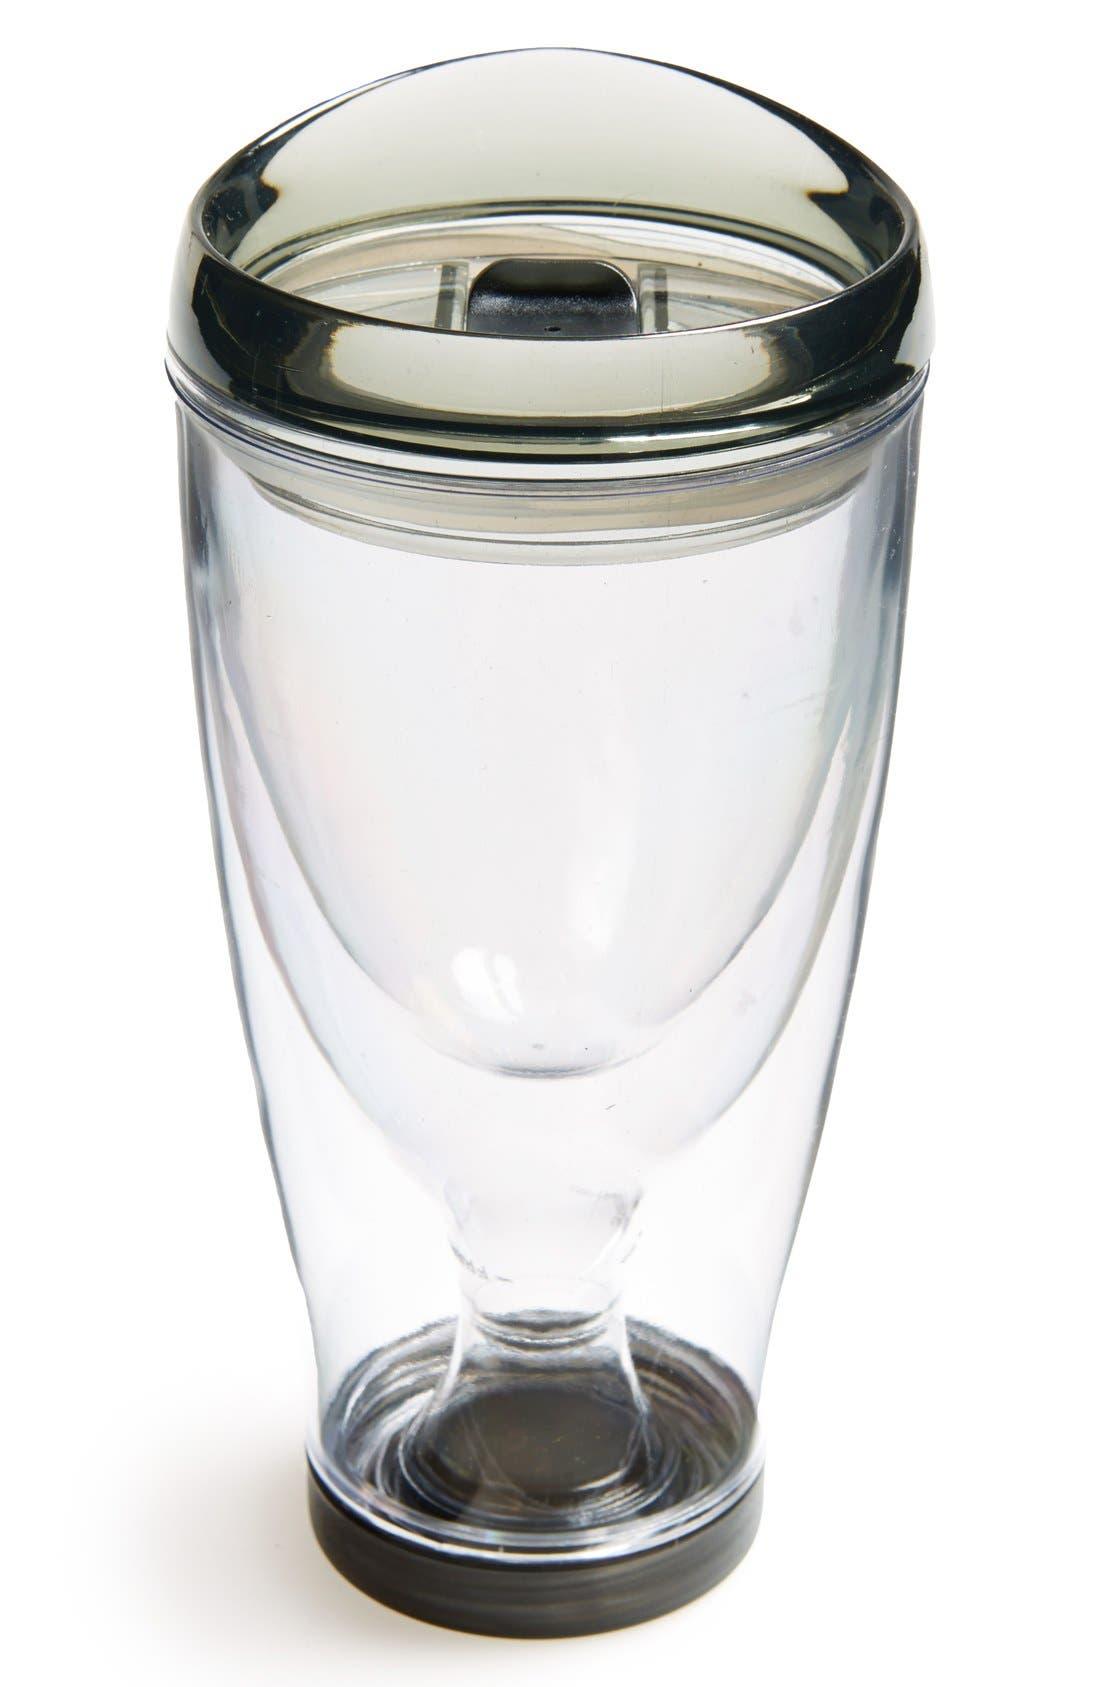 Main Image - Ad-N-Art 'Ice Vino 2 Go' Insulated Tumbler